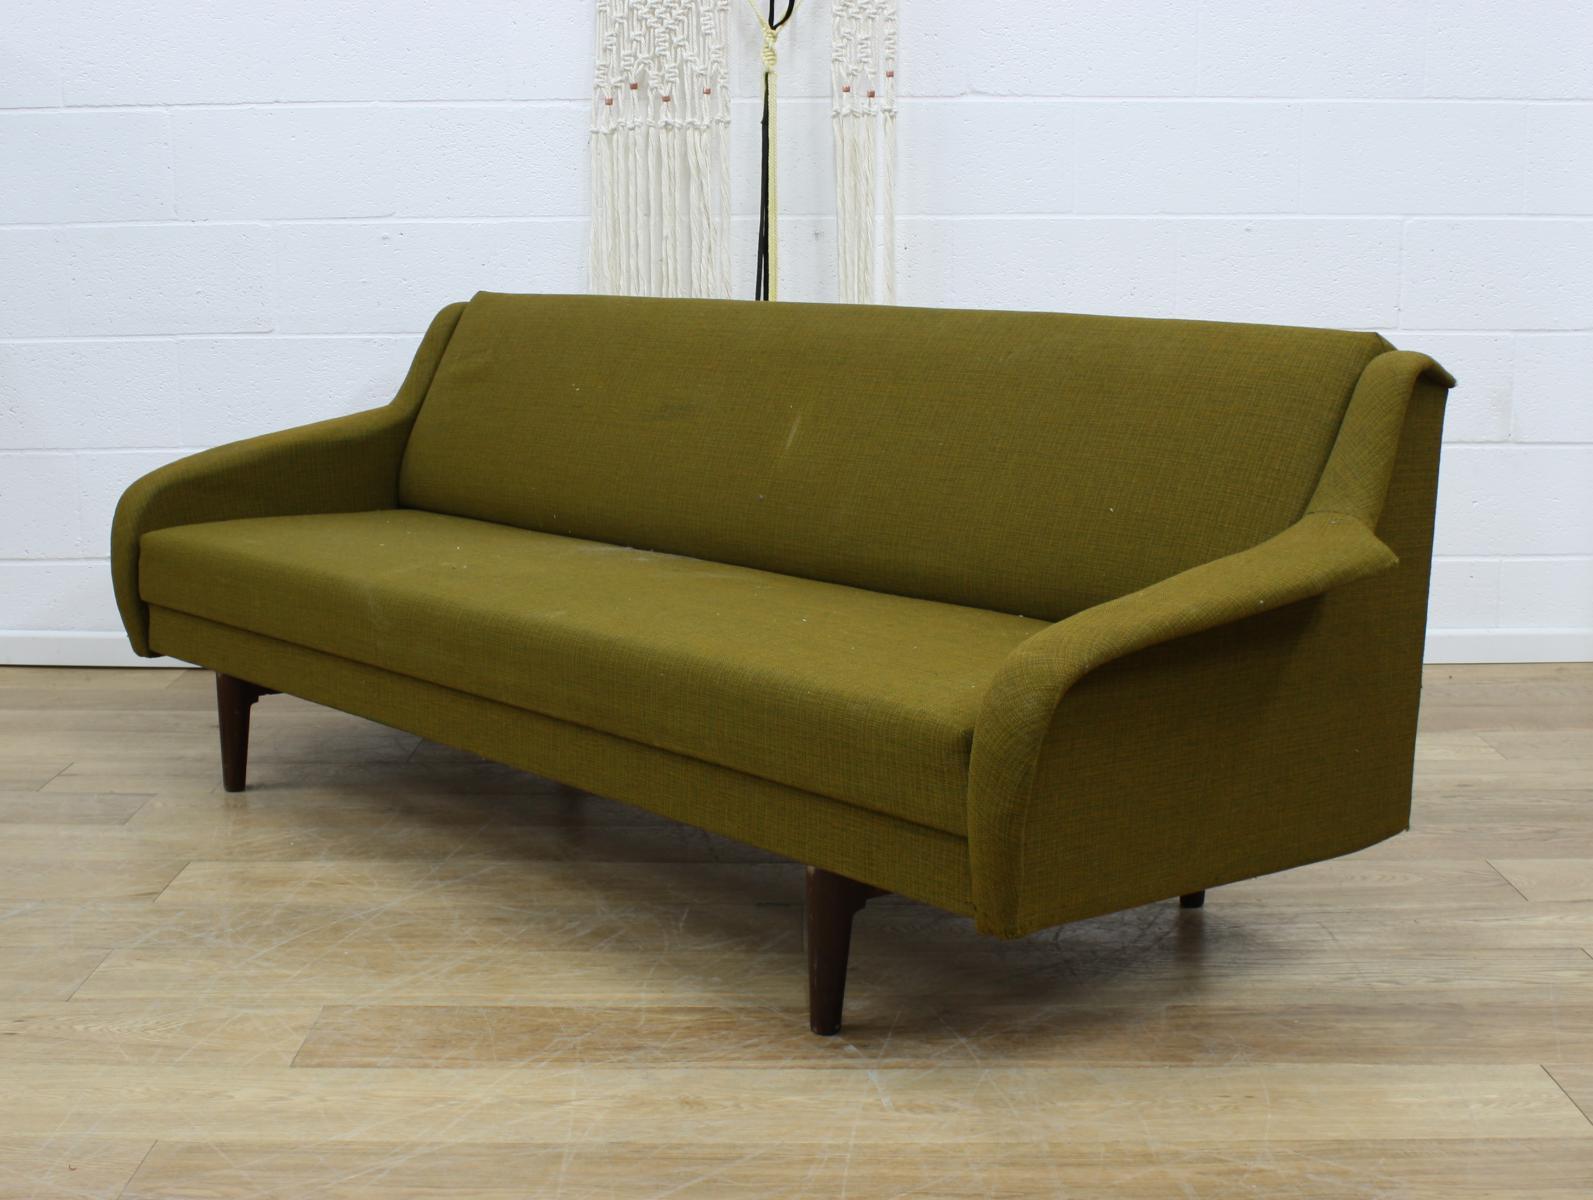 Danish midcentury vintage double sofa bed retro 60s ebay for Sofa bed 60s